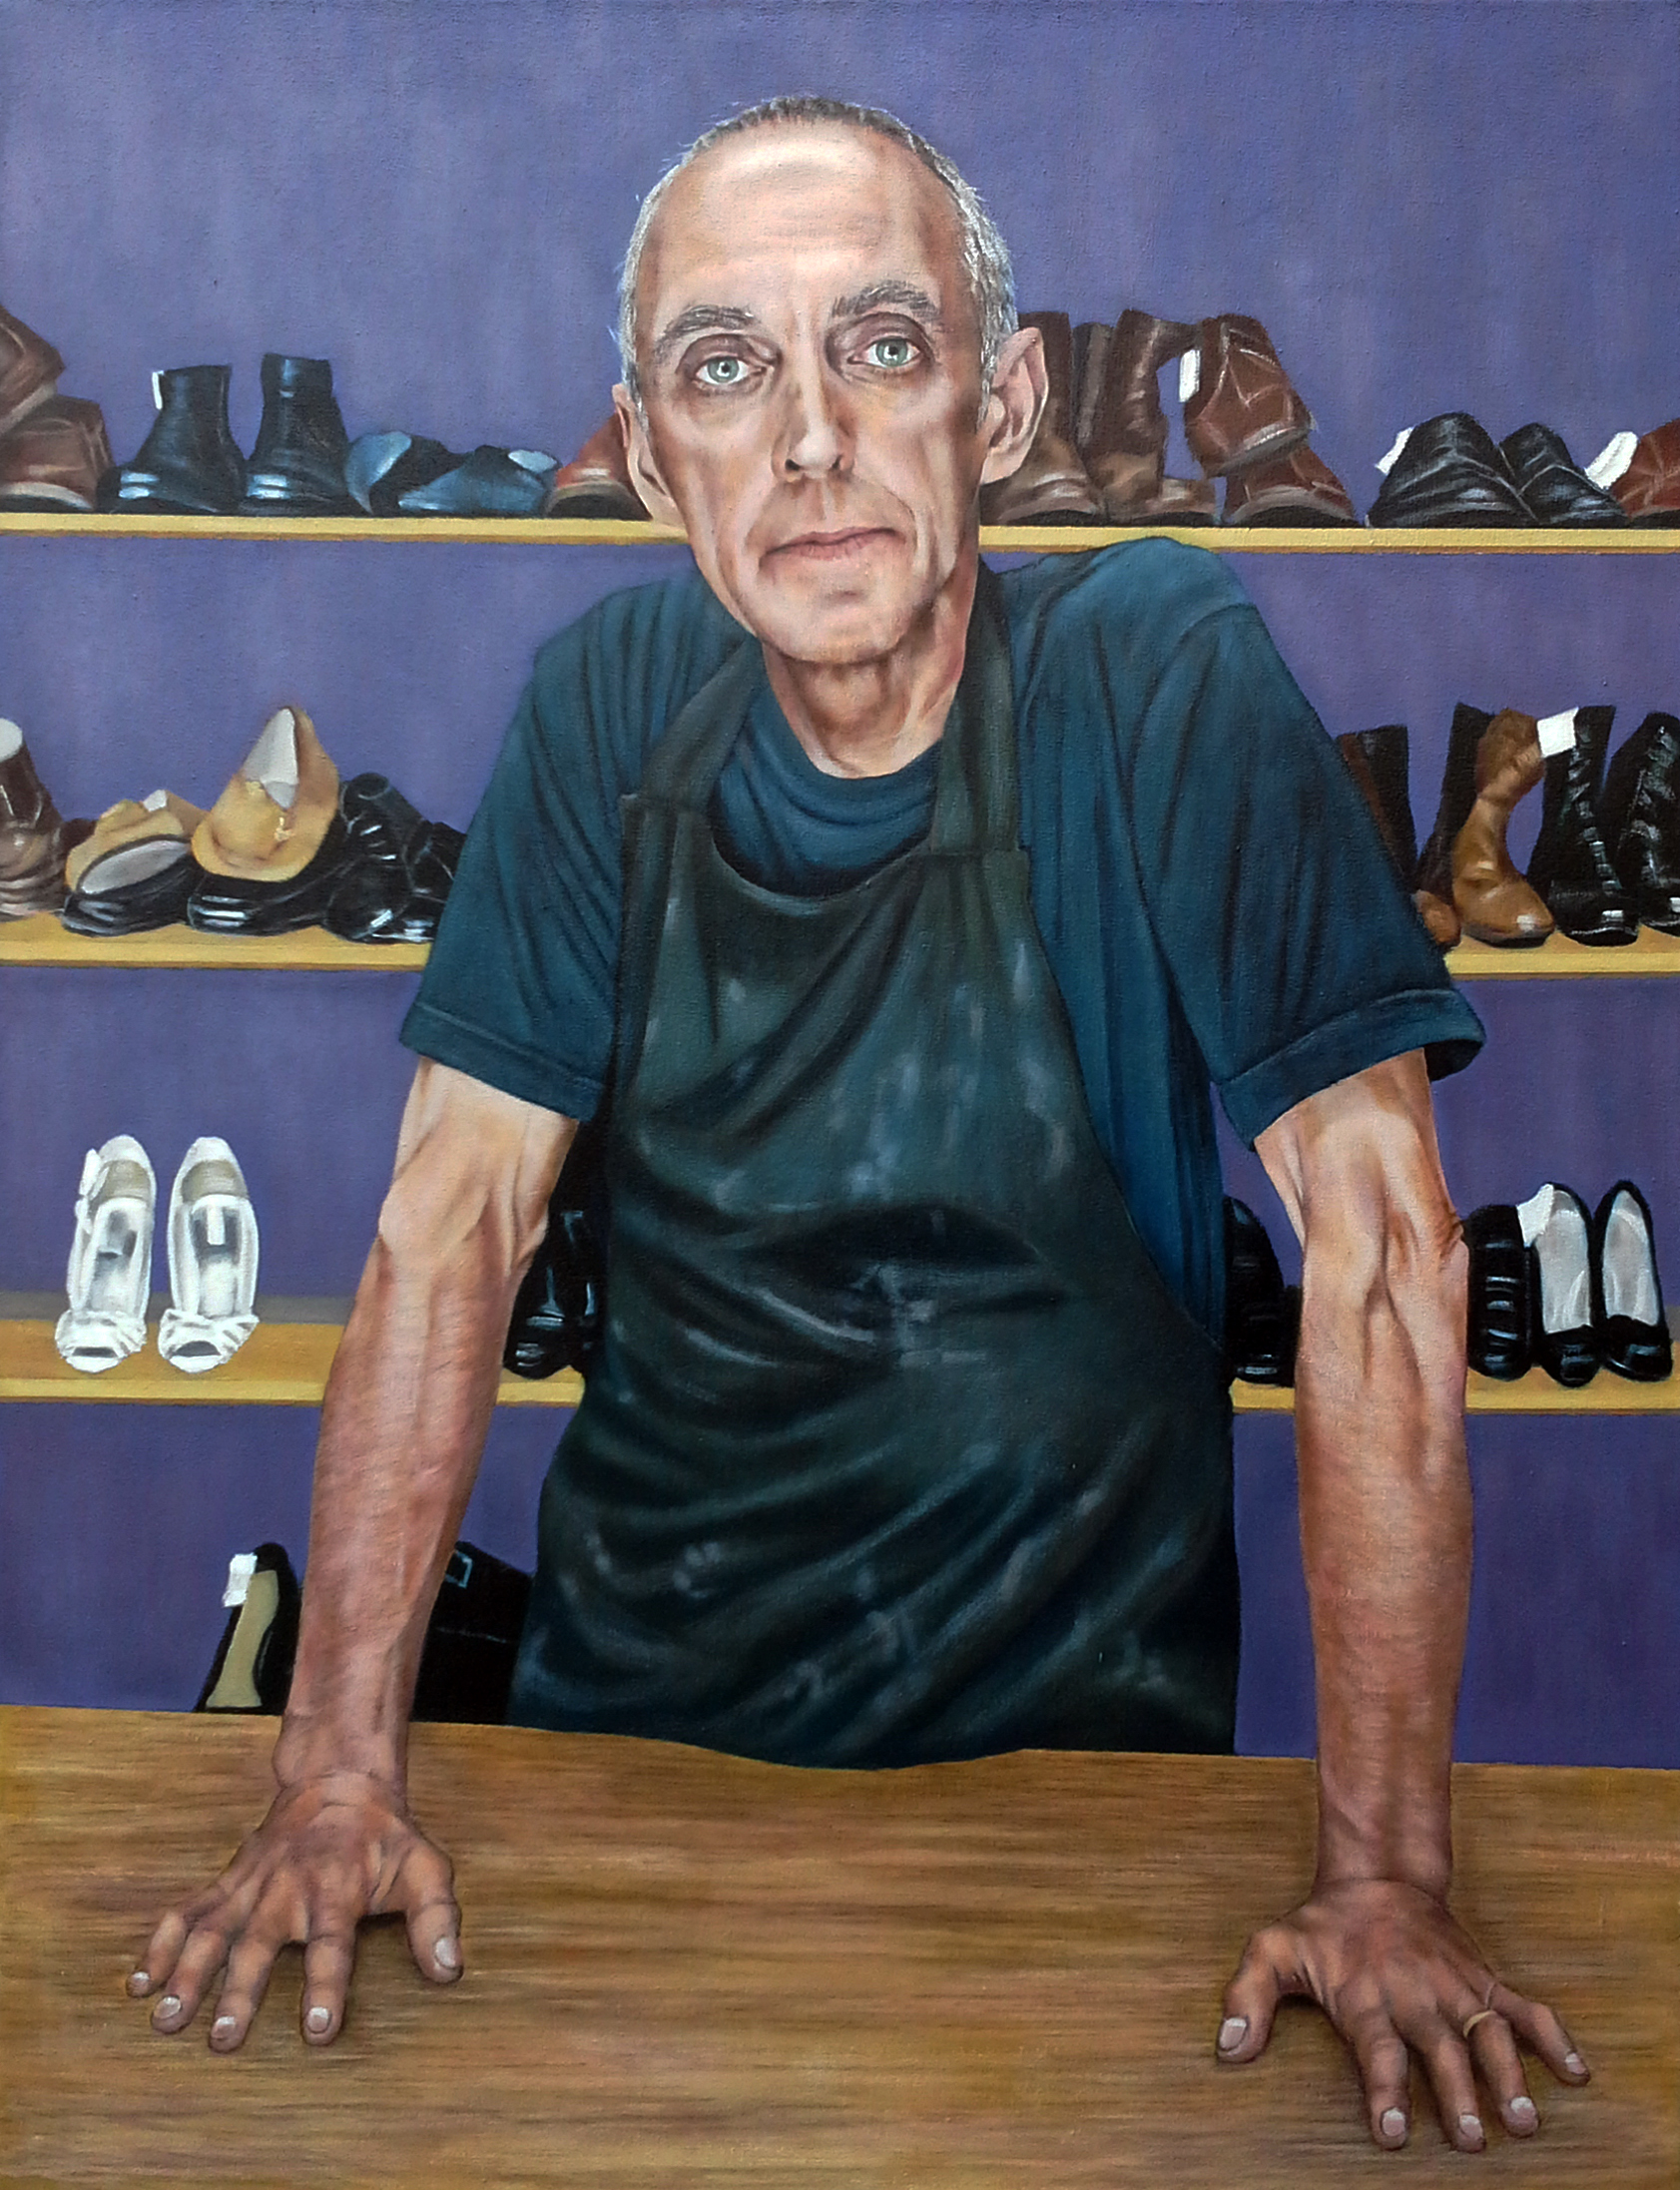 David Duncan, The Shoemaker